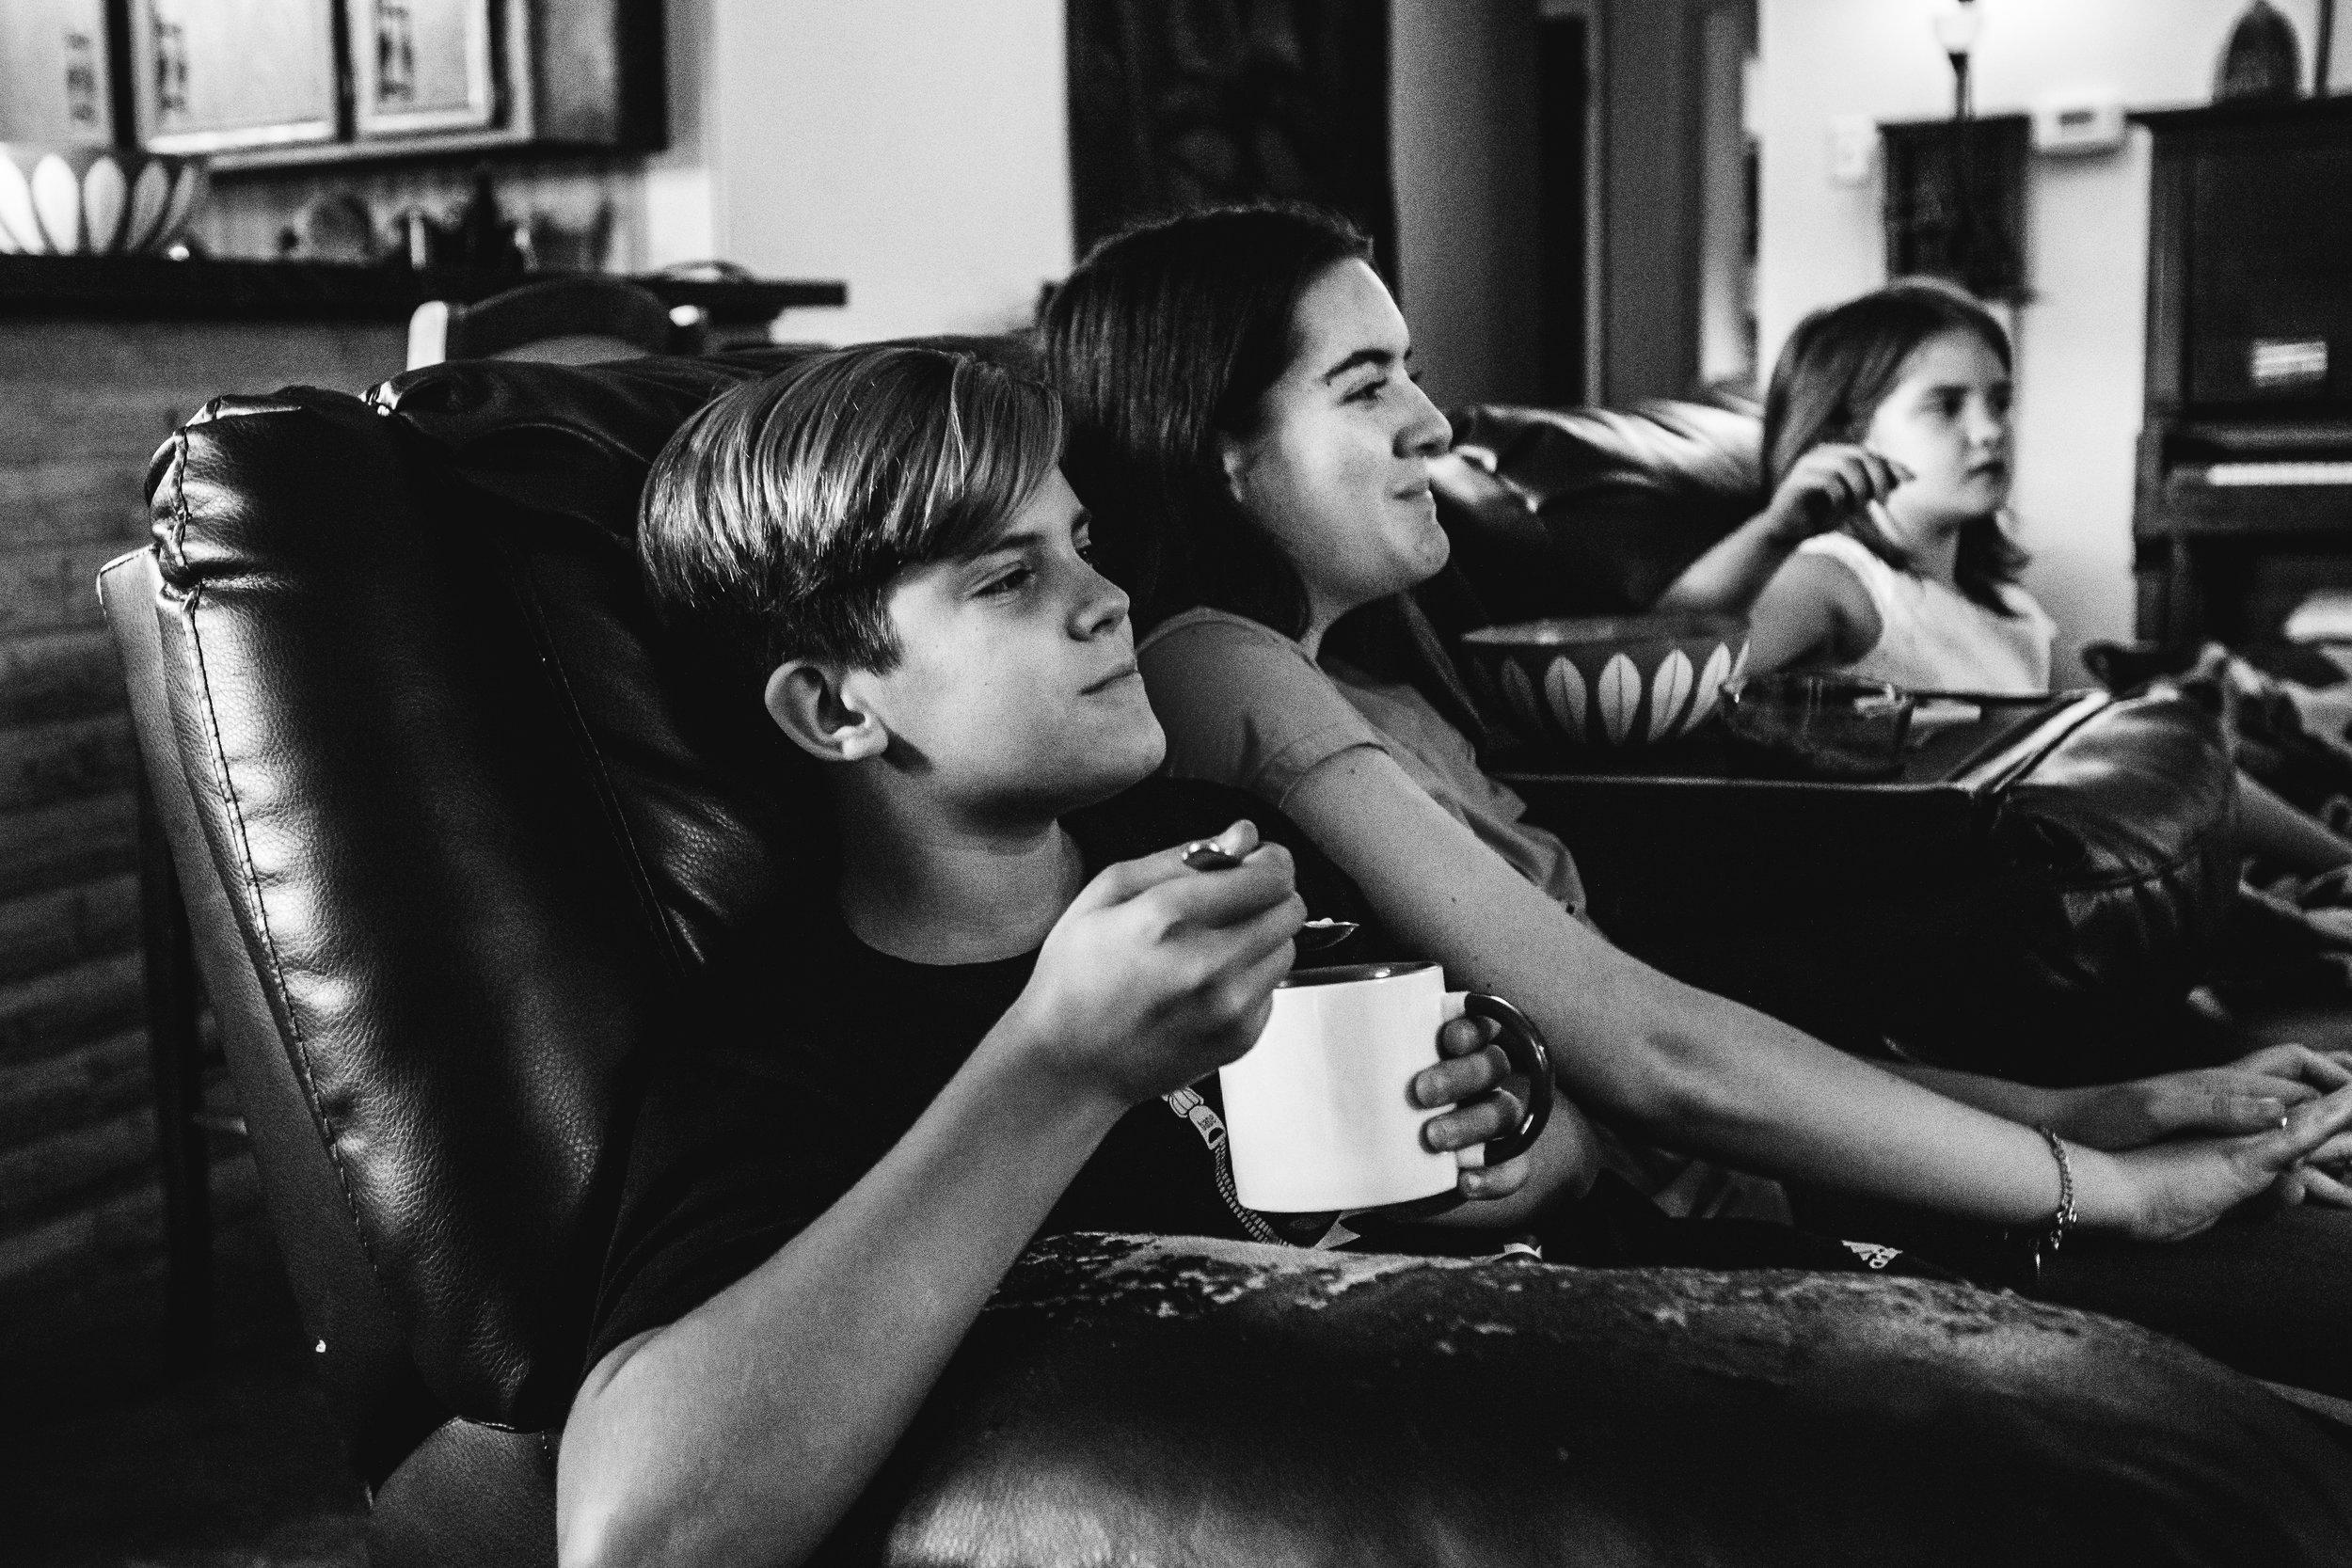 family-photographer-houston-miertschin-0030.jpg